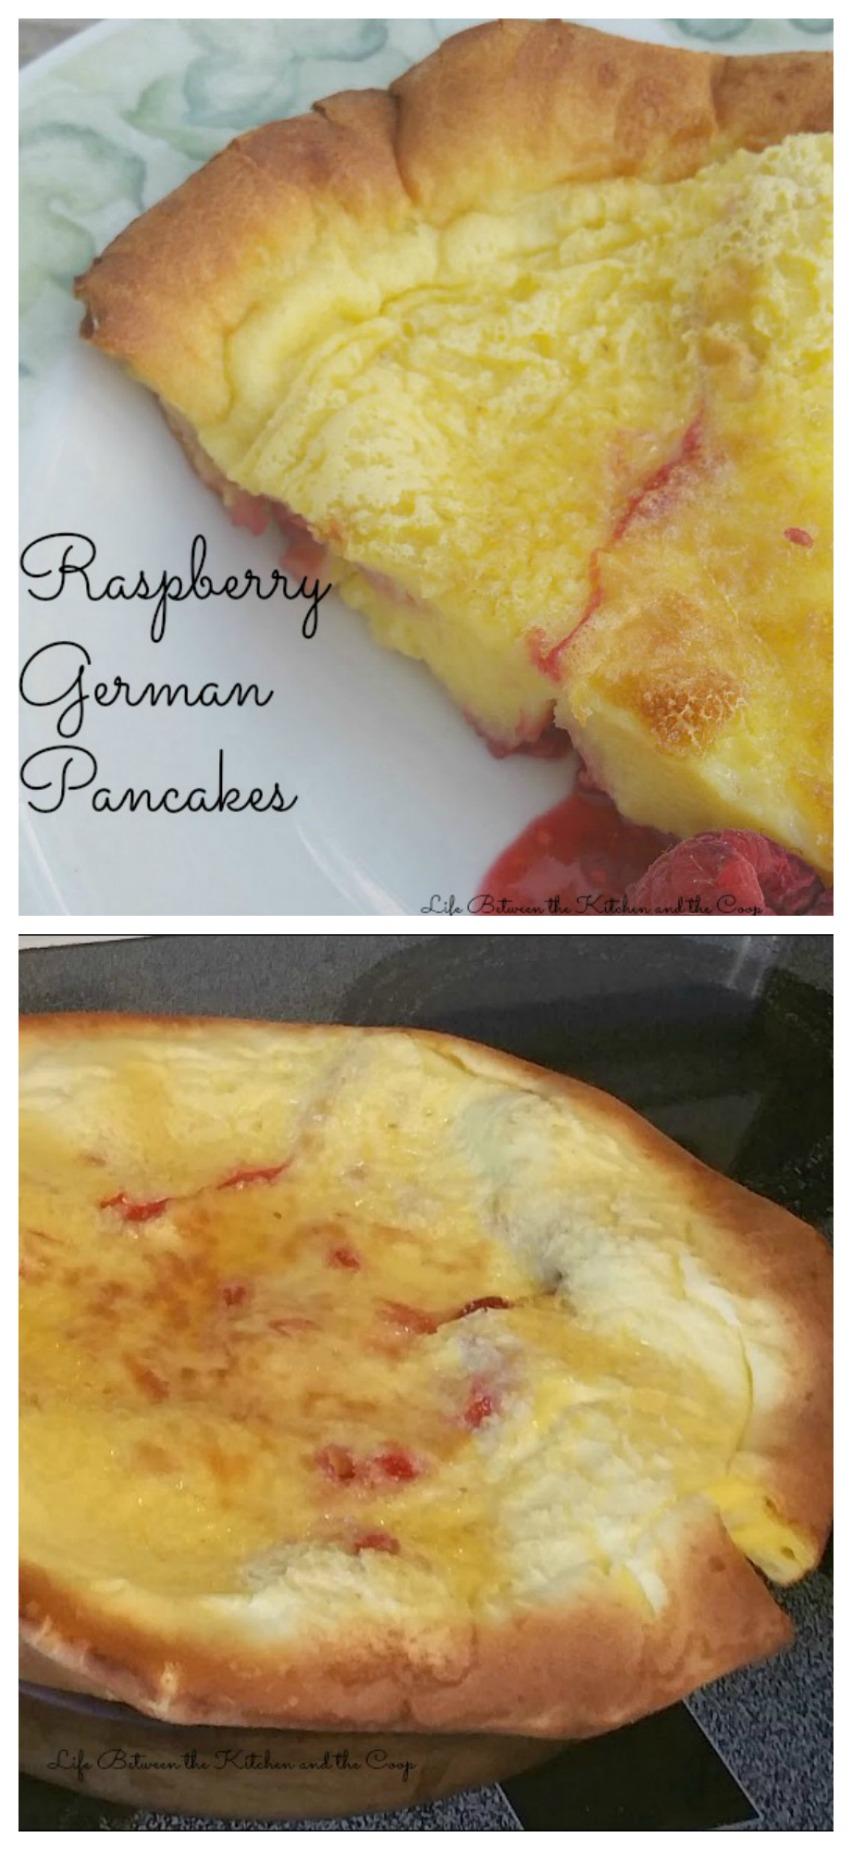 breakfast, egg recipe, raspberries, baking, delicious, yum